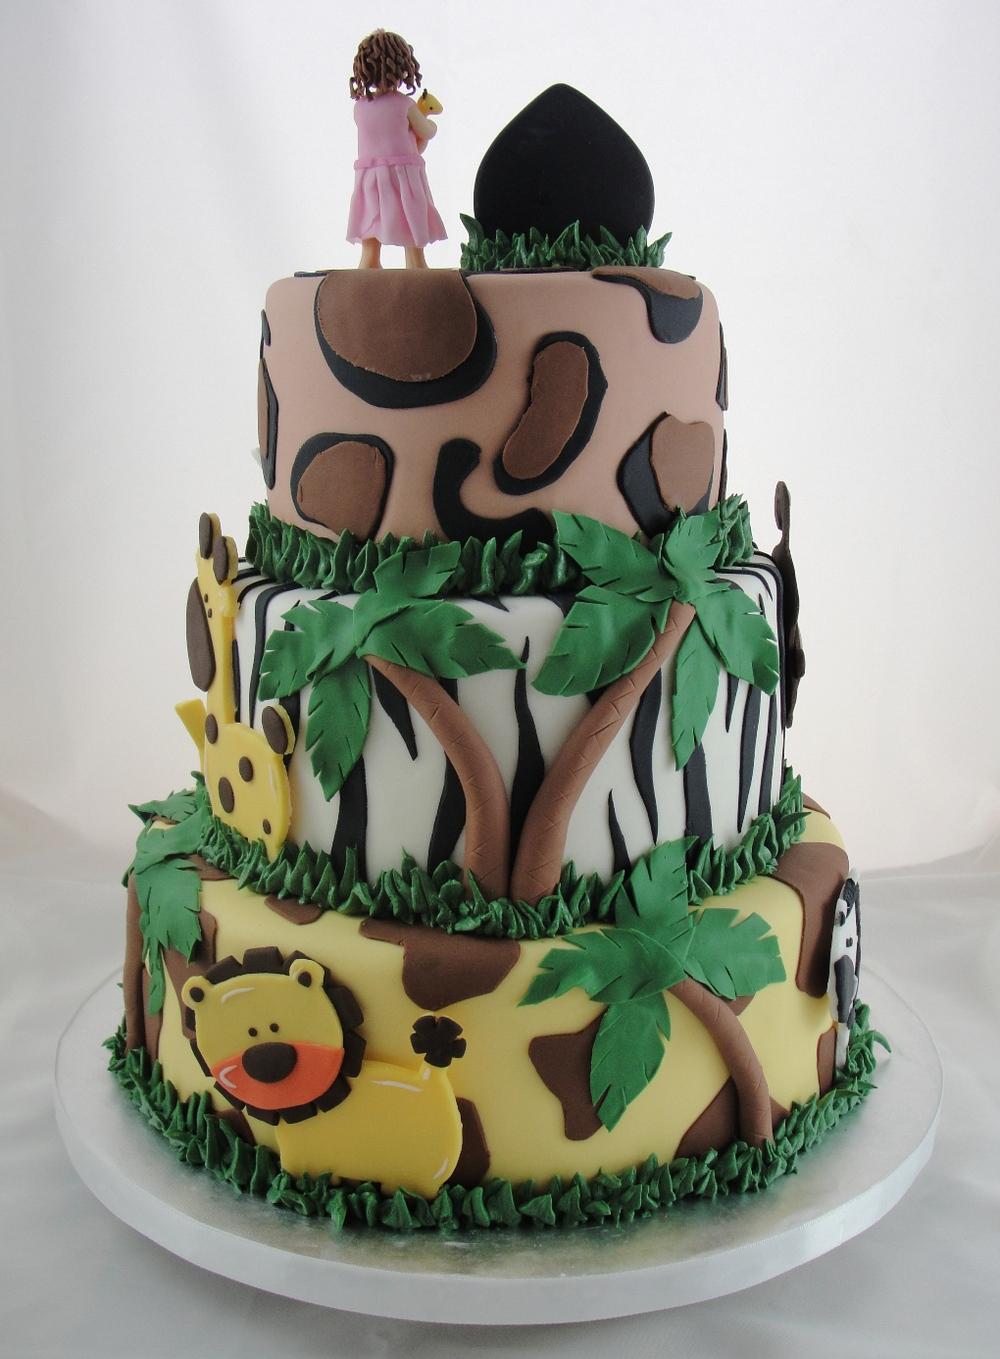 LBC 1403 - Jungle Cake 4.jpg